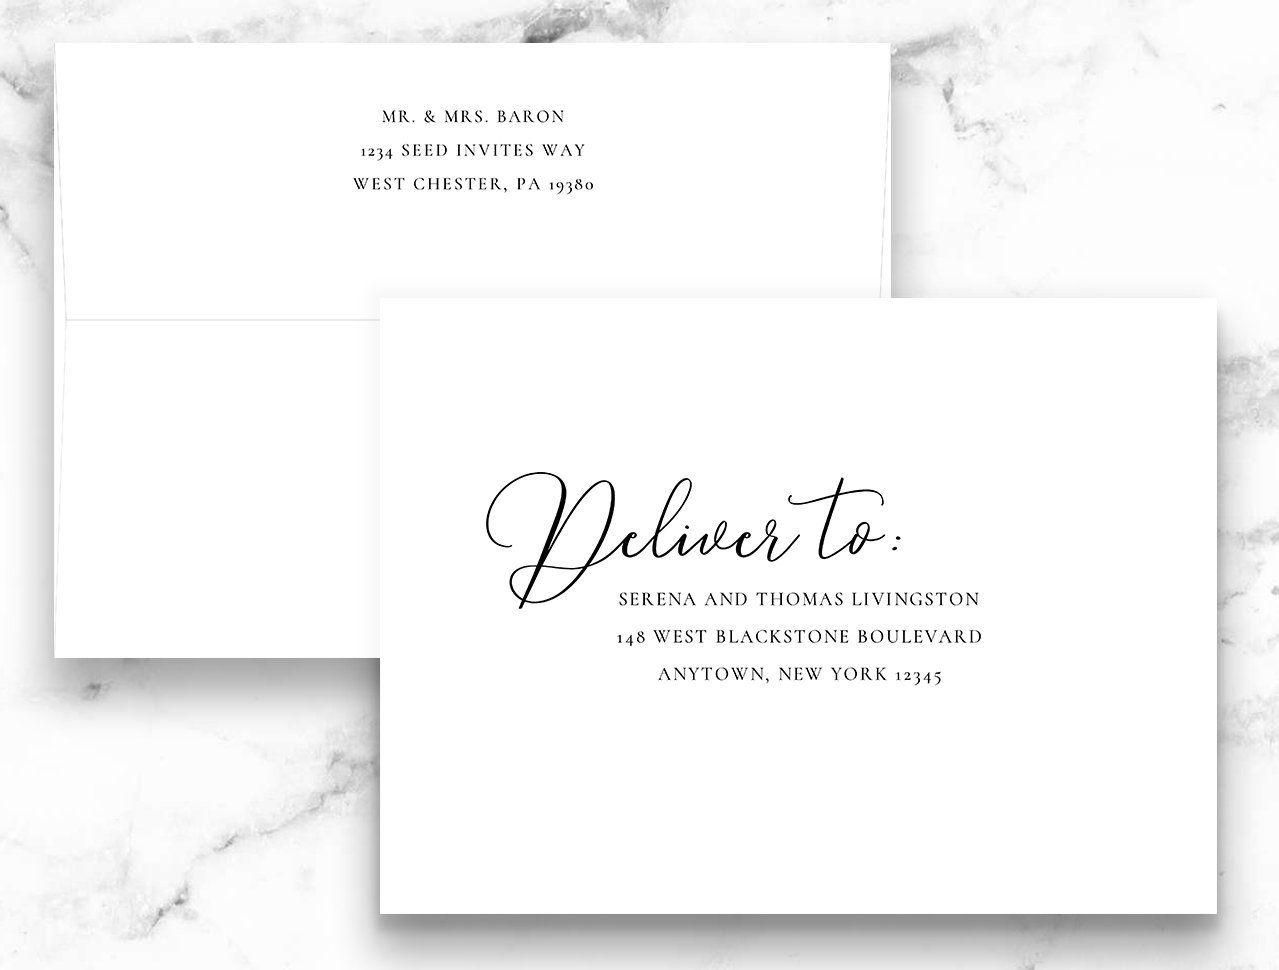 0 95 White A7 Envelope Address Printing Envelope Guest Return Address Digital Printed Cal Envelope Address Printing Addressing Envelopes Printed Envelopes